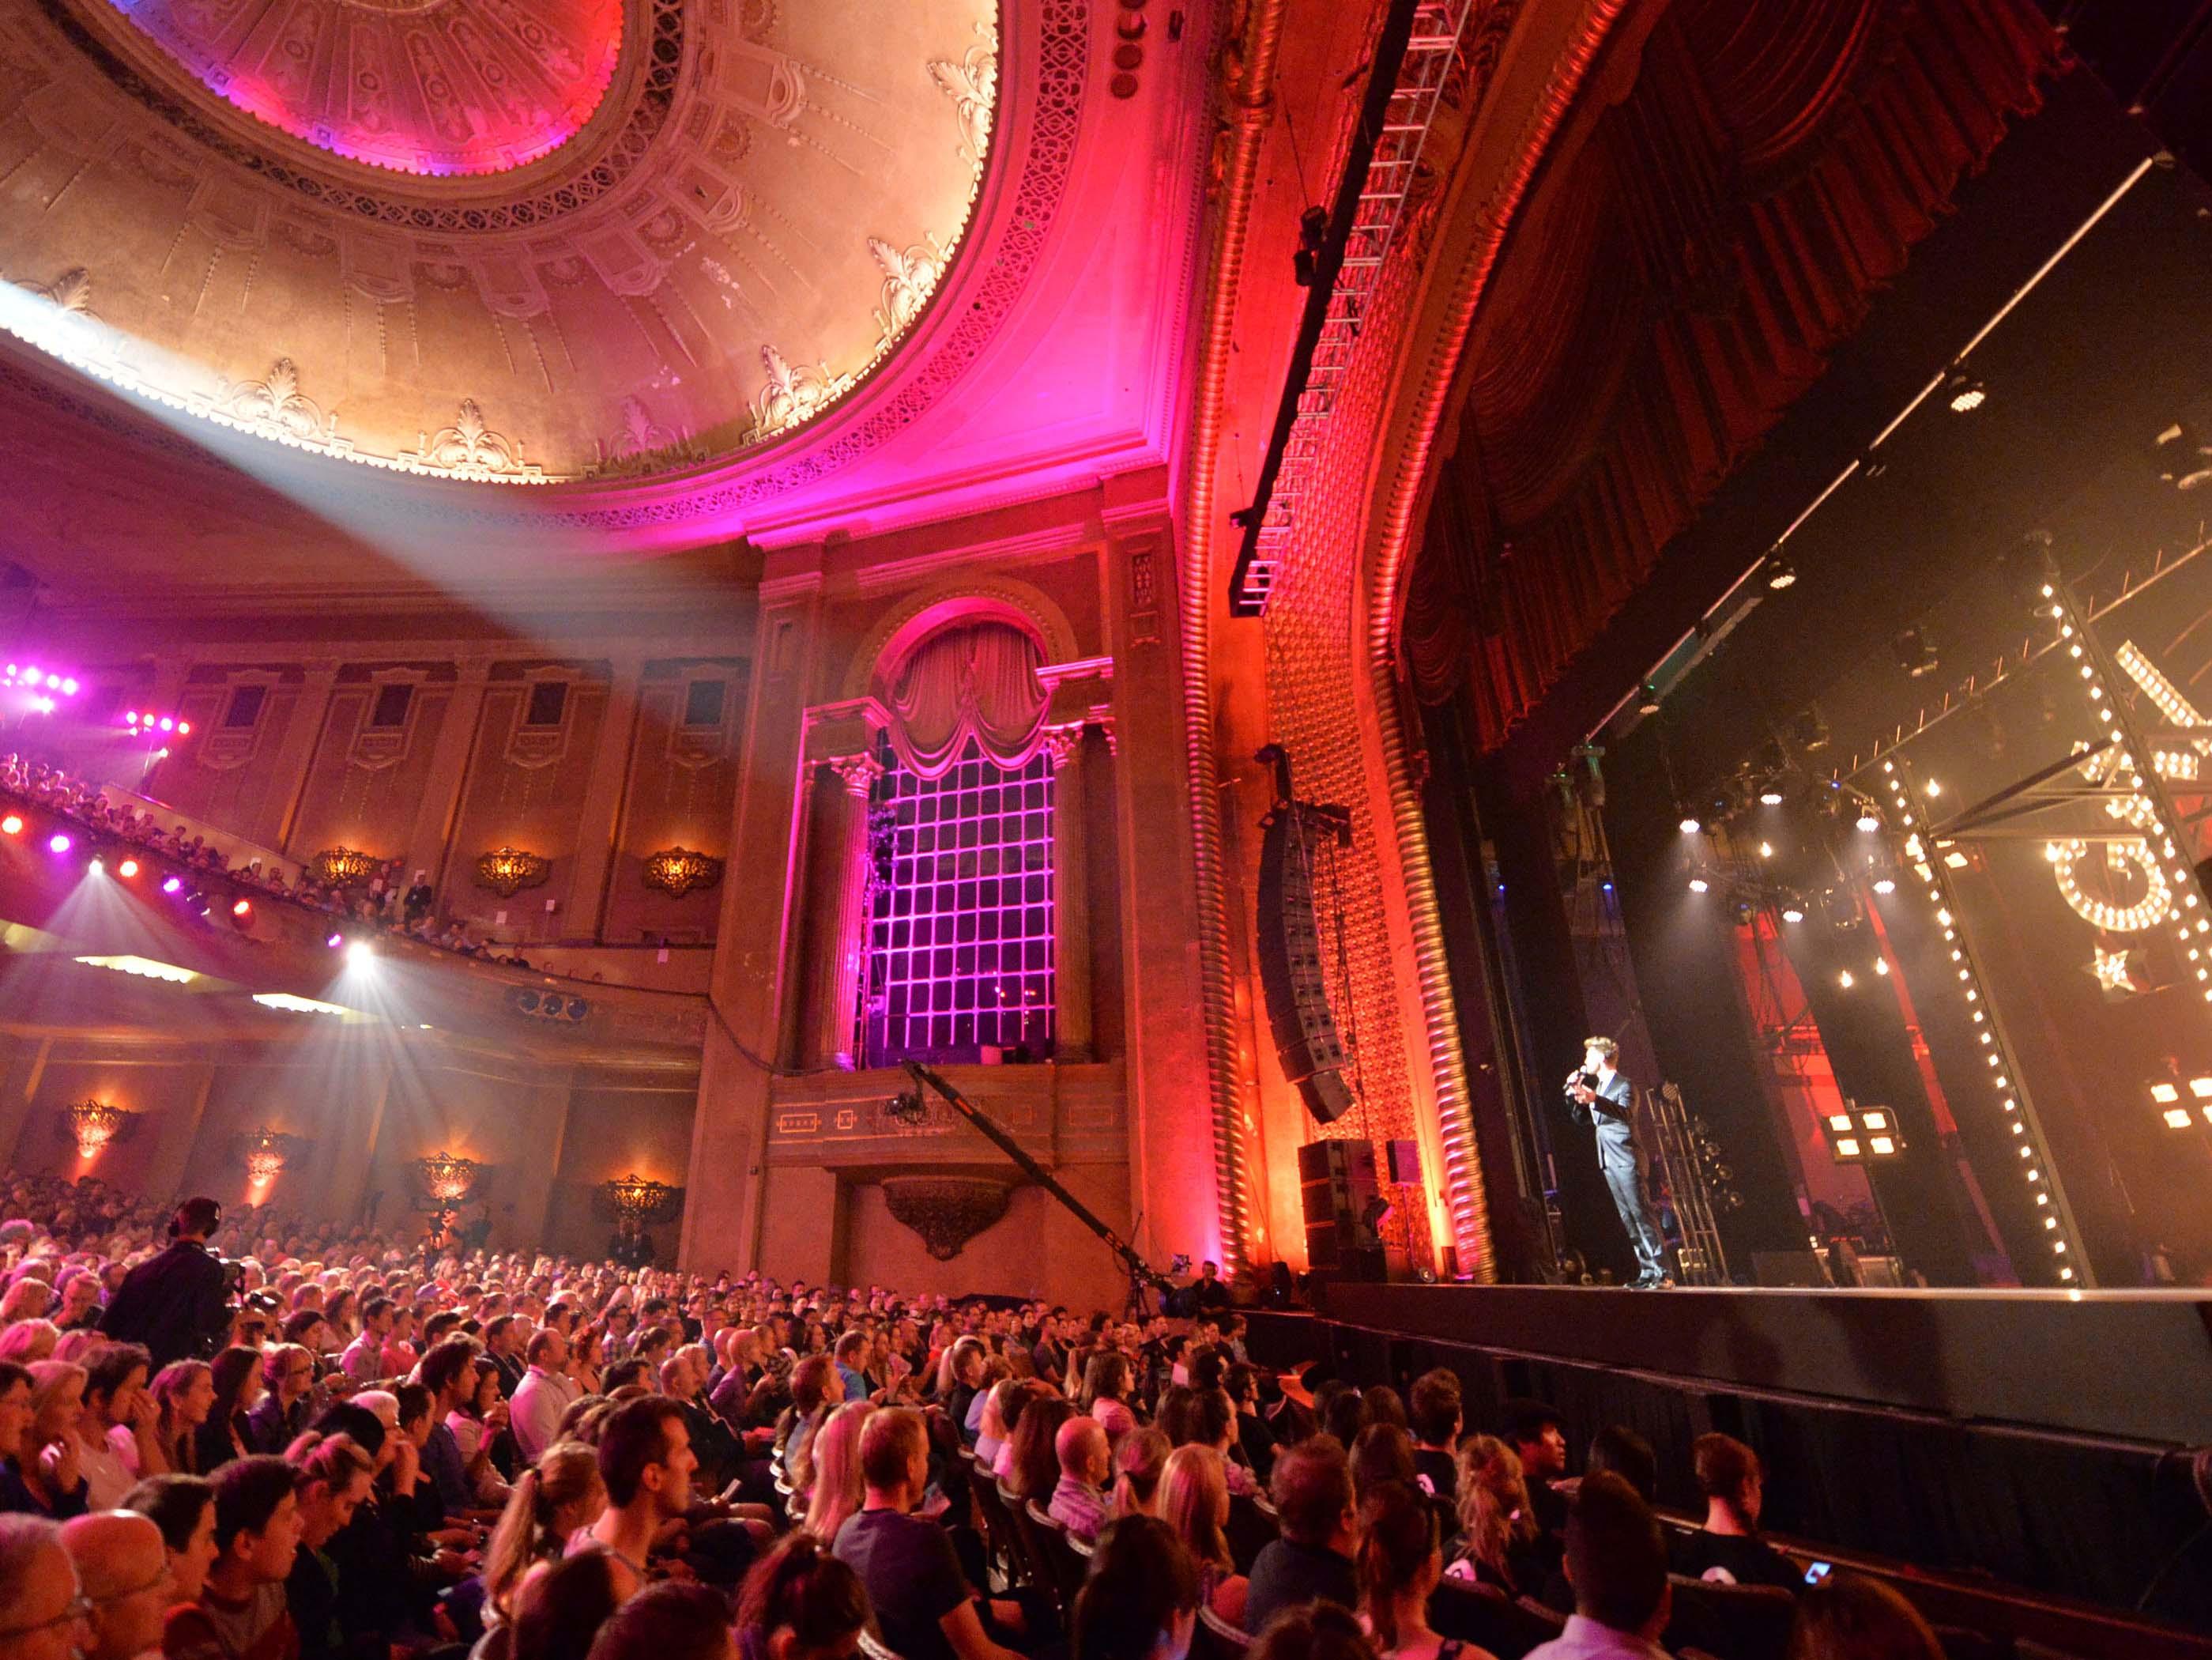 Melbourne International Comedy Festival, Palais Theatre, St Kilda, Melbourne, Victoria, Australia. Photo: Jim Lee